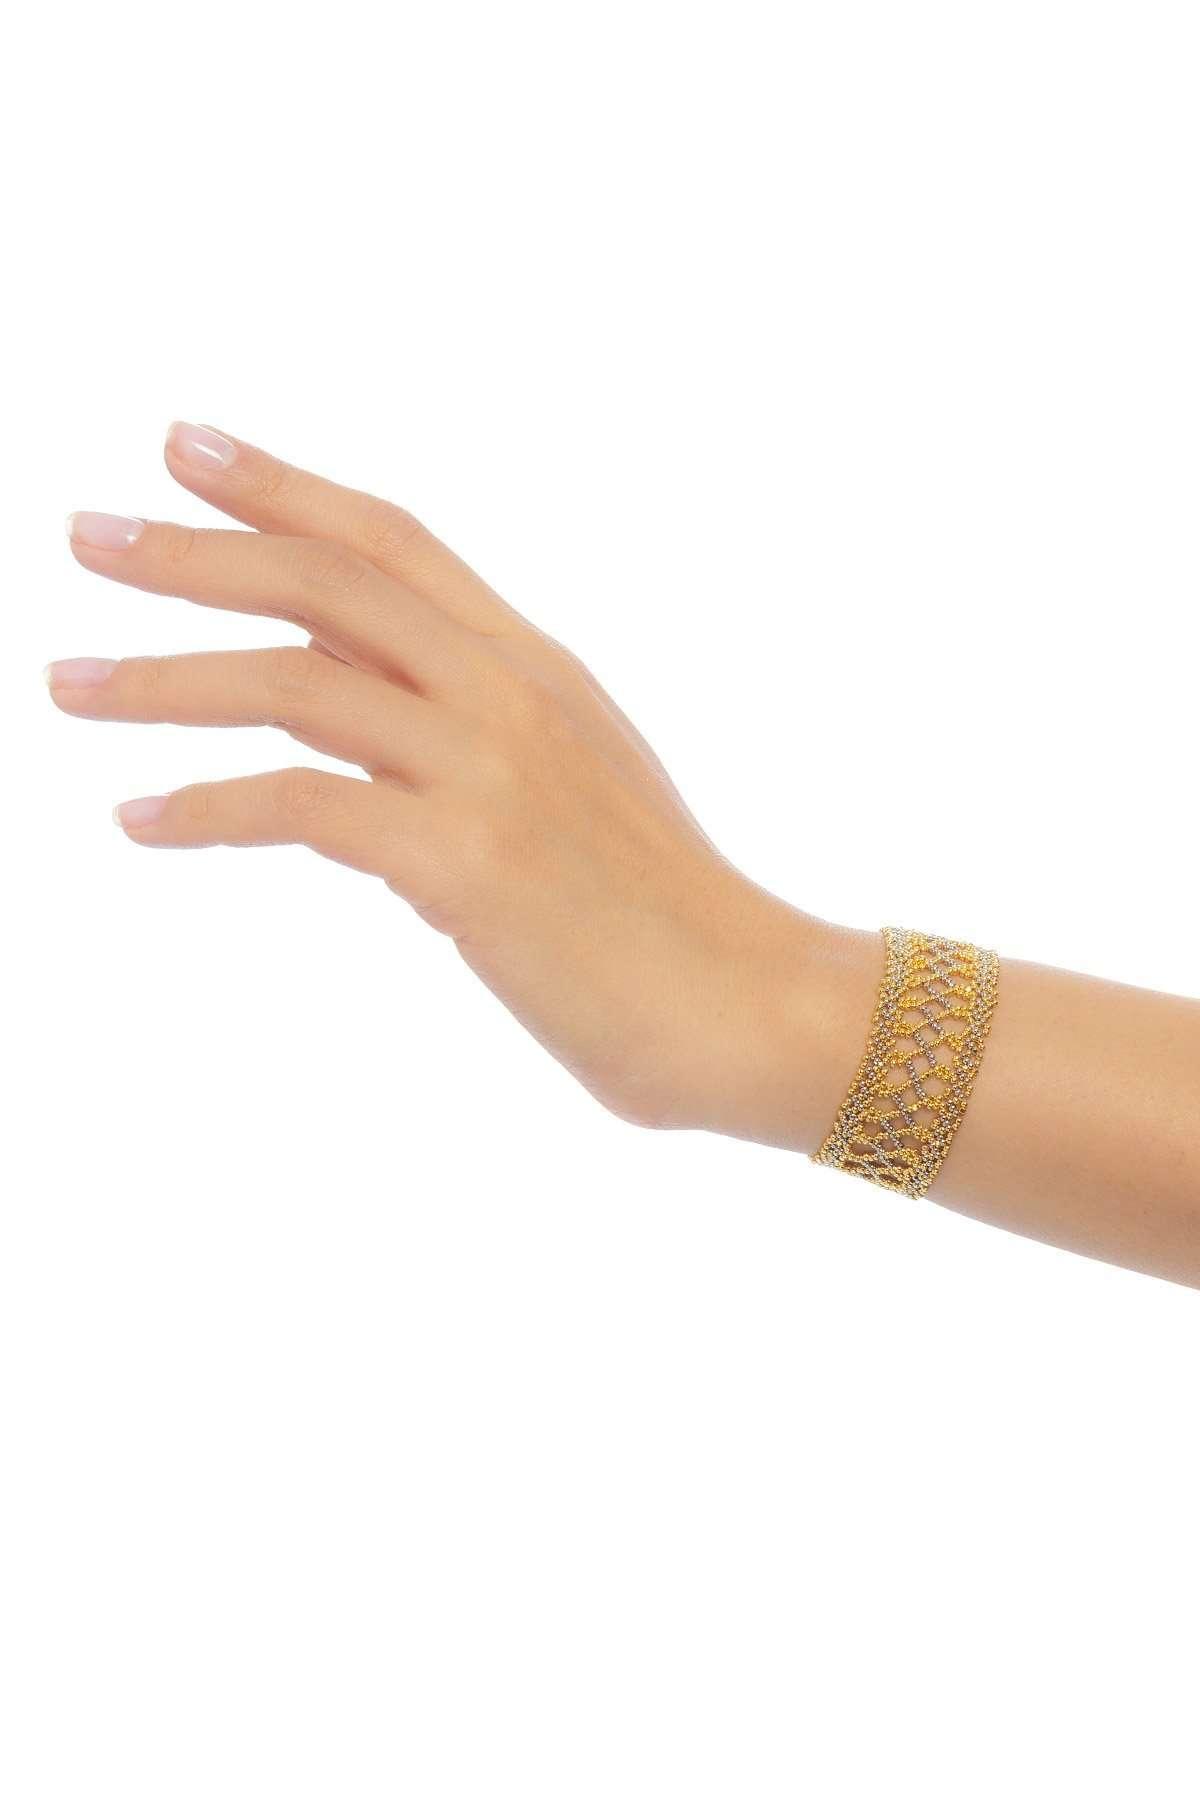 012-brazalete-mediano-tejido-abierto-oro-platino-alt1